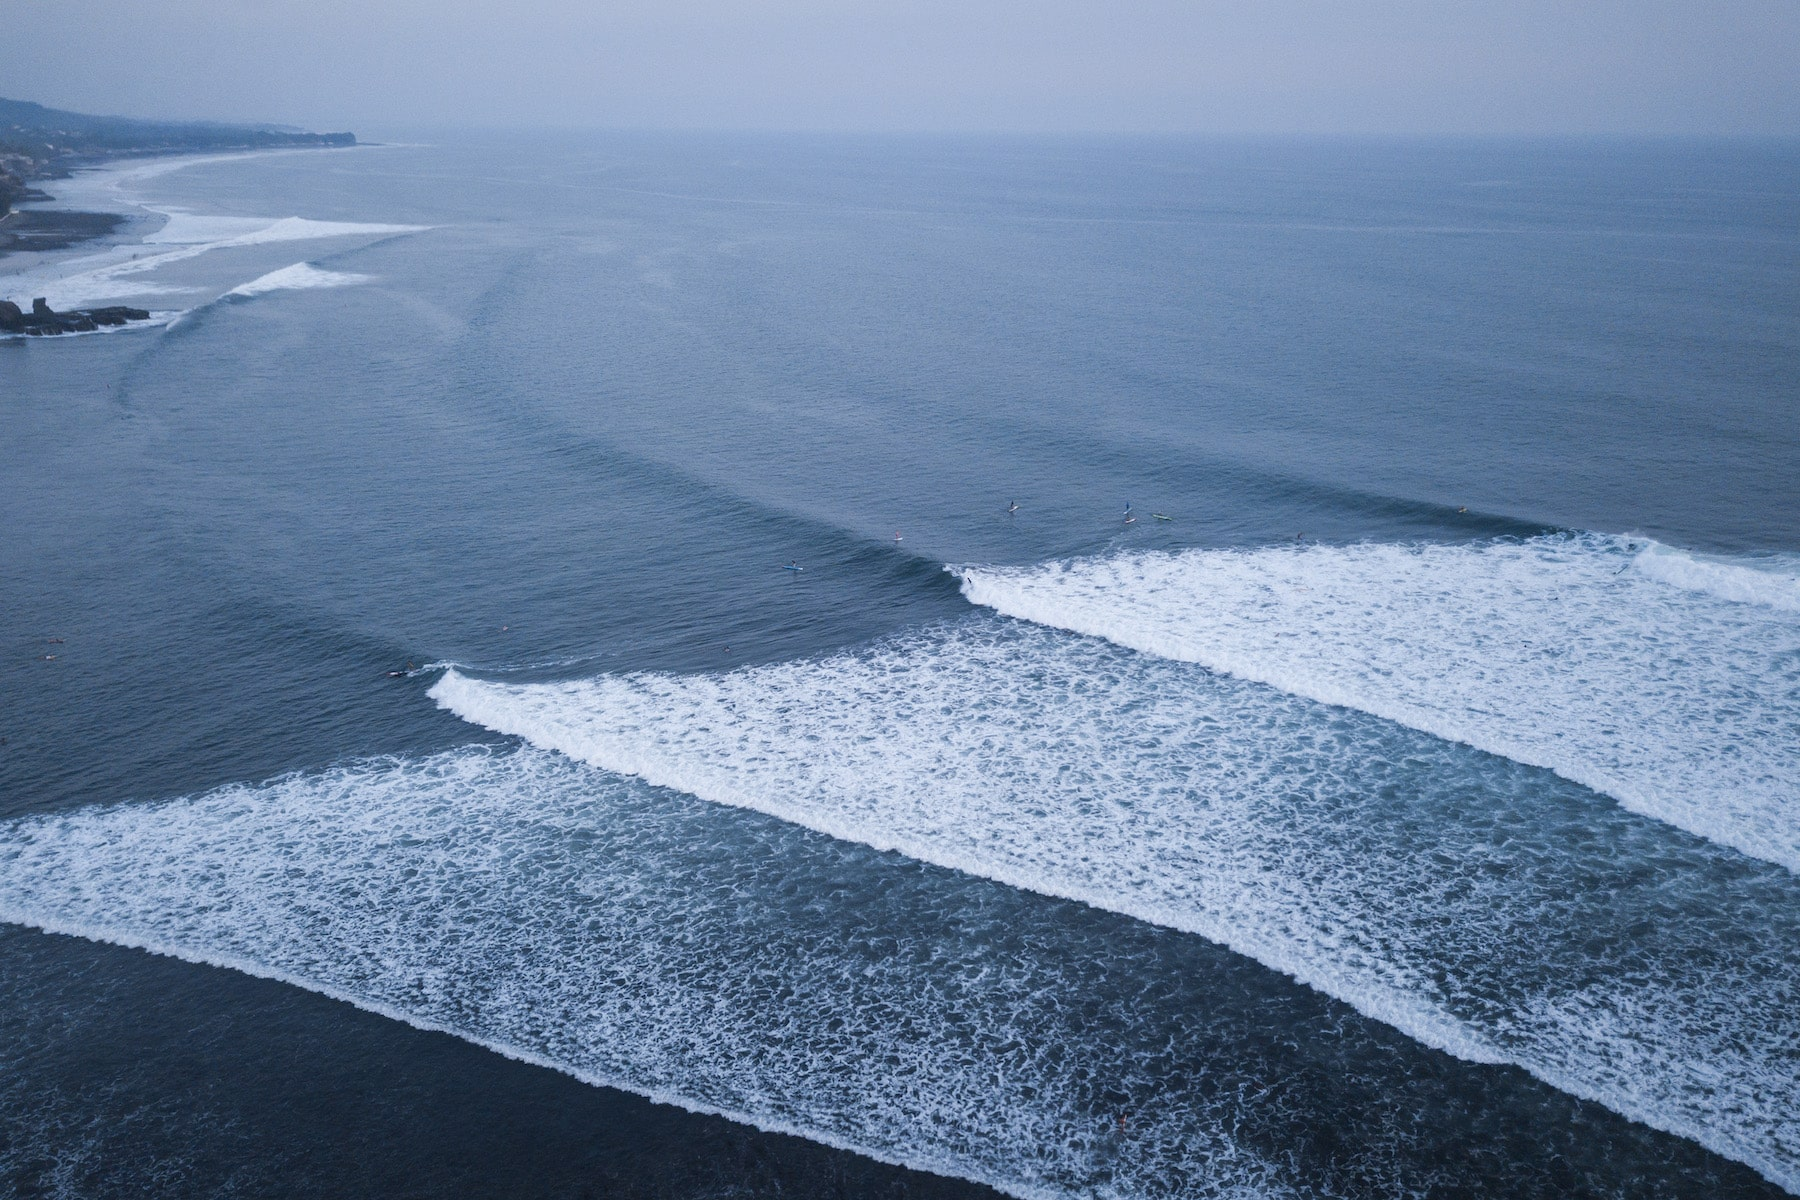 image for: Surf City El Salvador ISA World Surfing Games